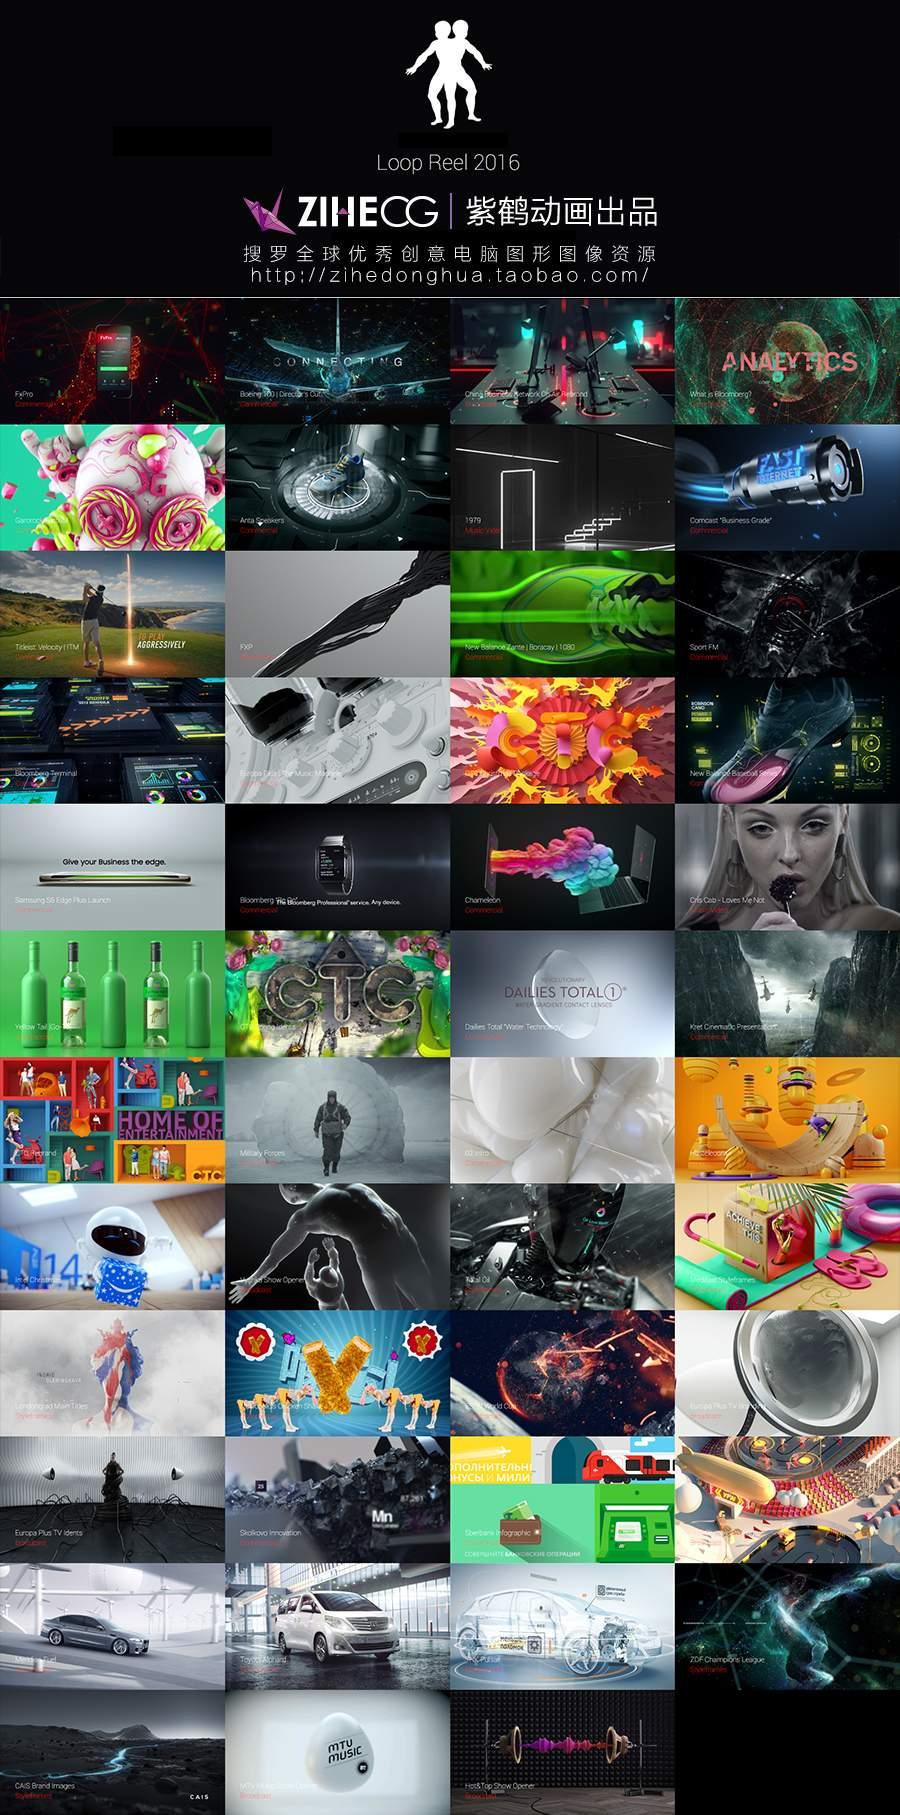 俄罗斯创意工作室LOOP 2016年作品集Showreel